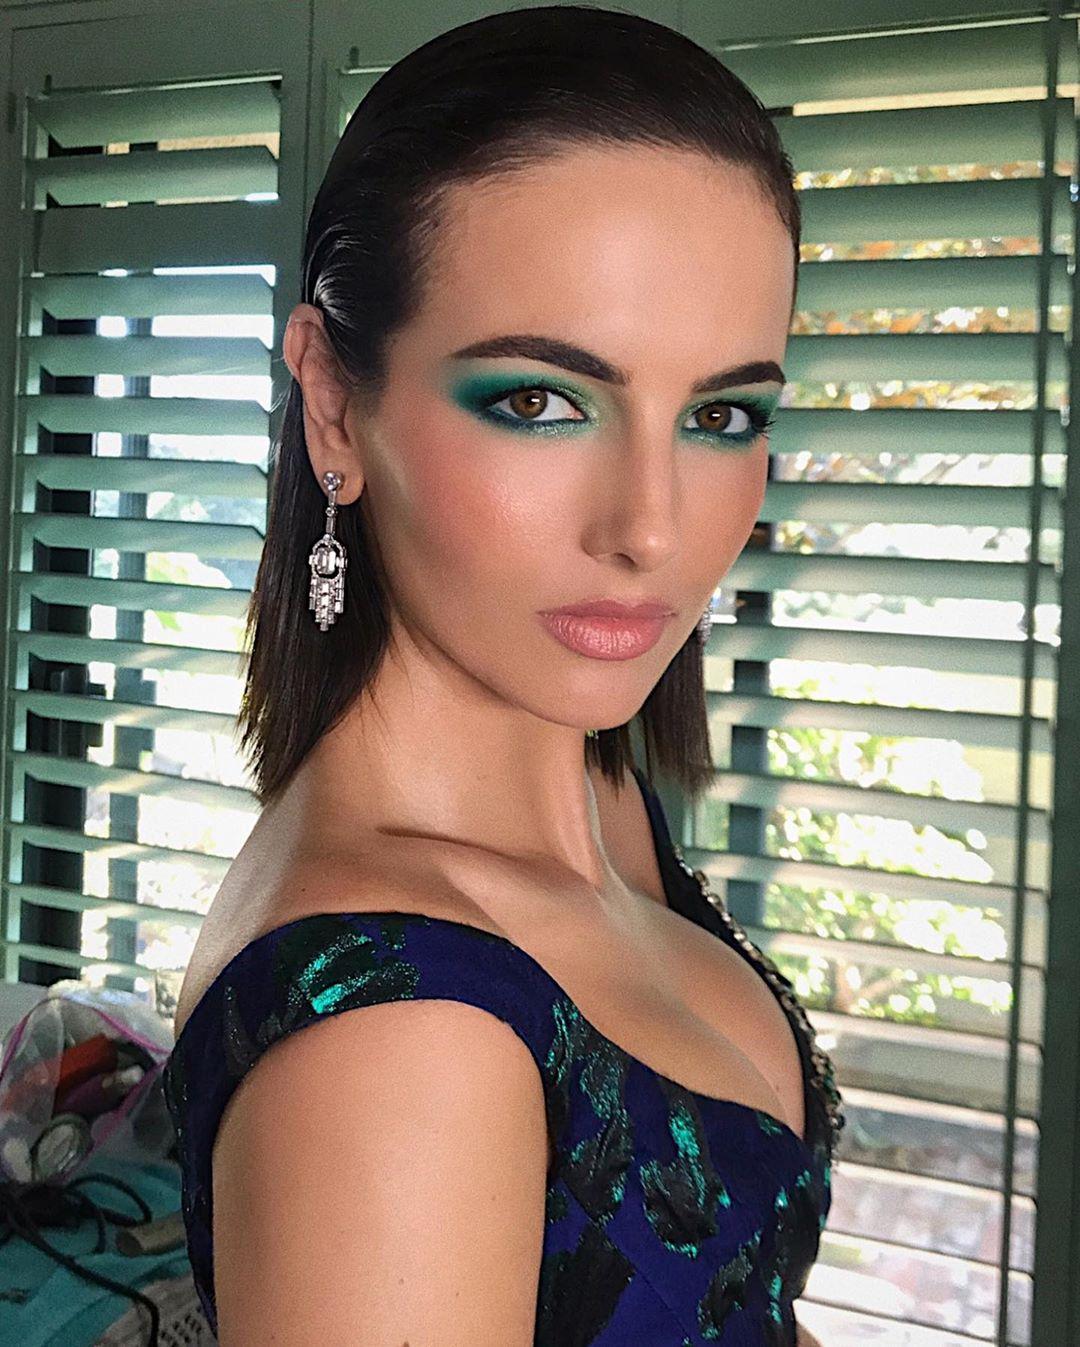 maquiagem colorida 15